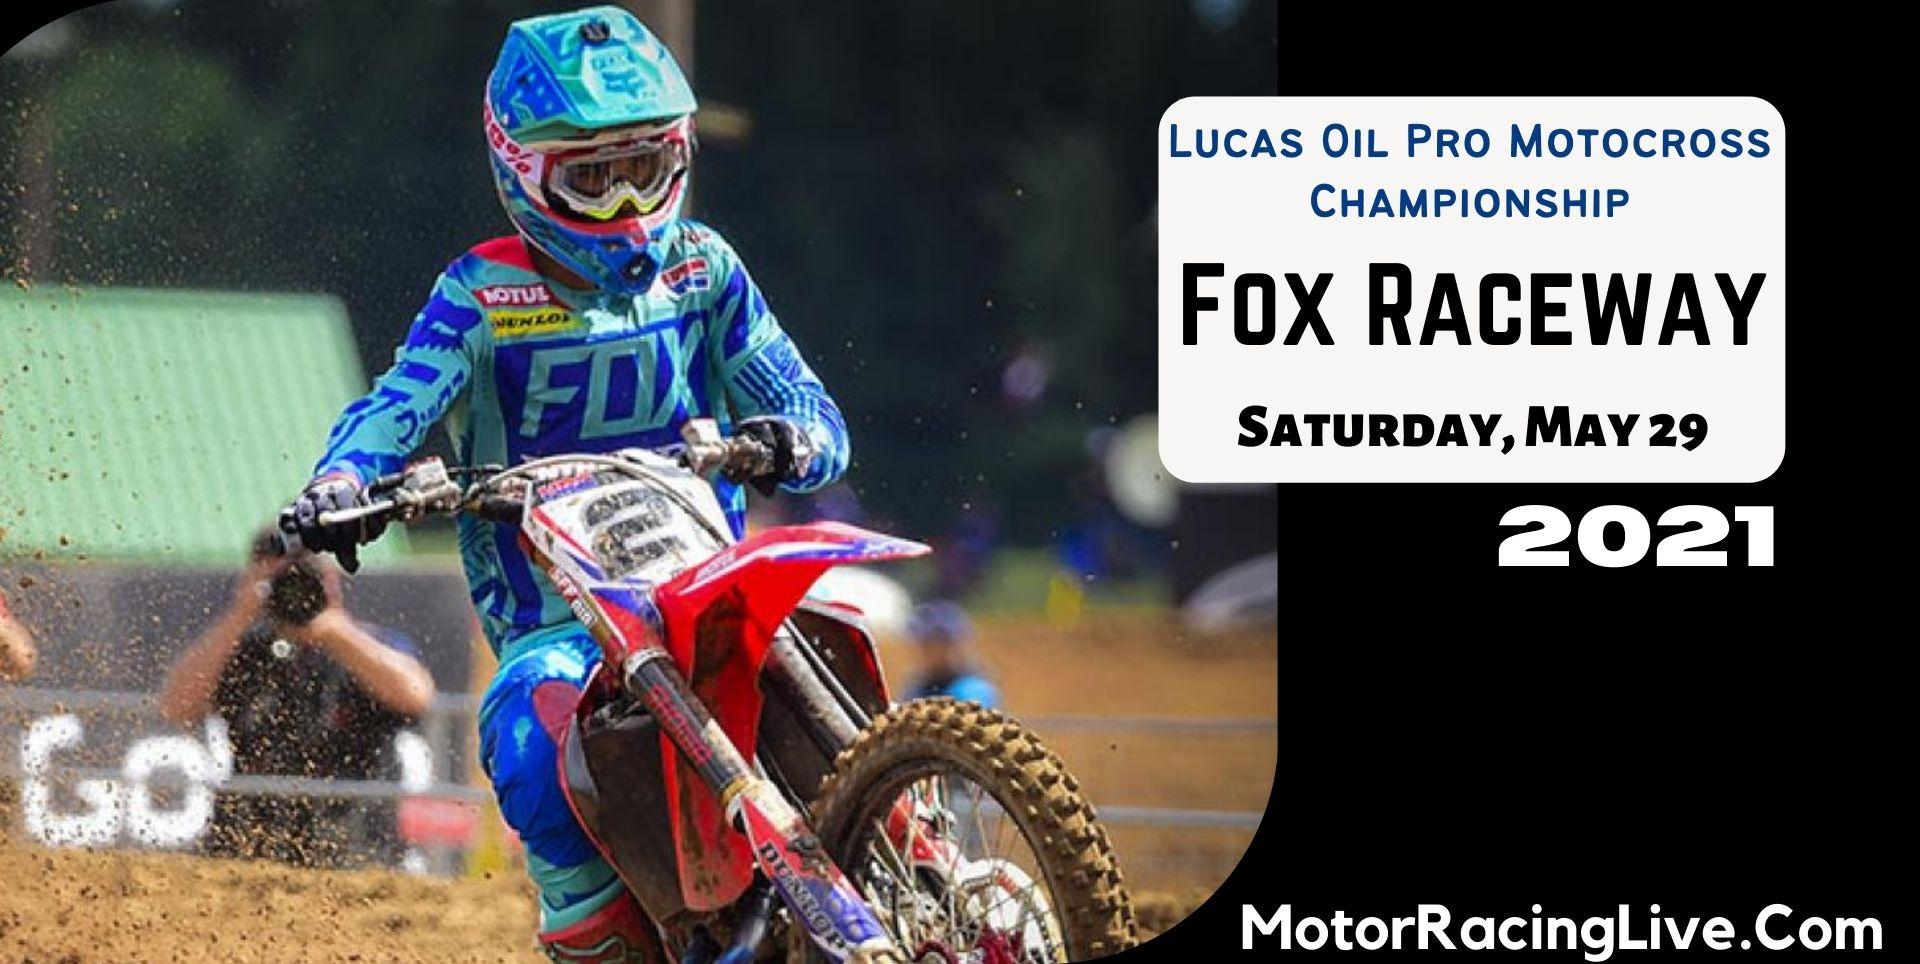 FOX Raceway Live Streaming 2021 | Motocross